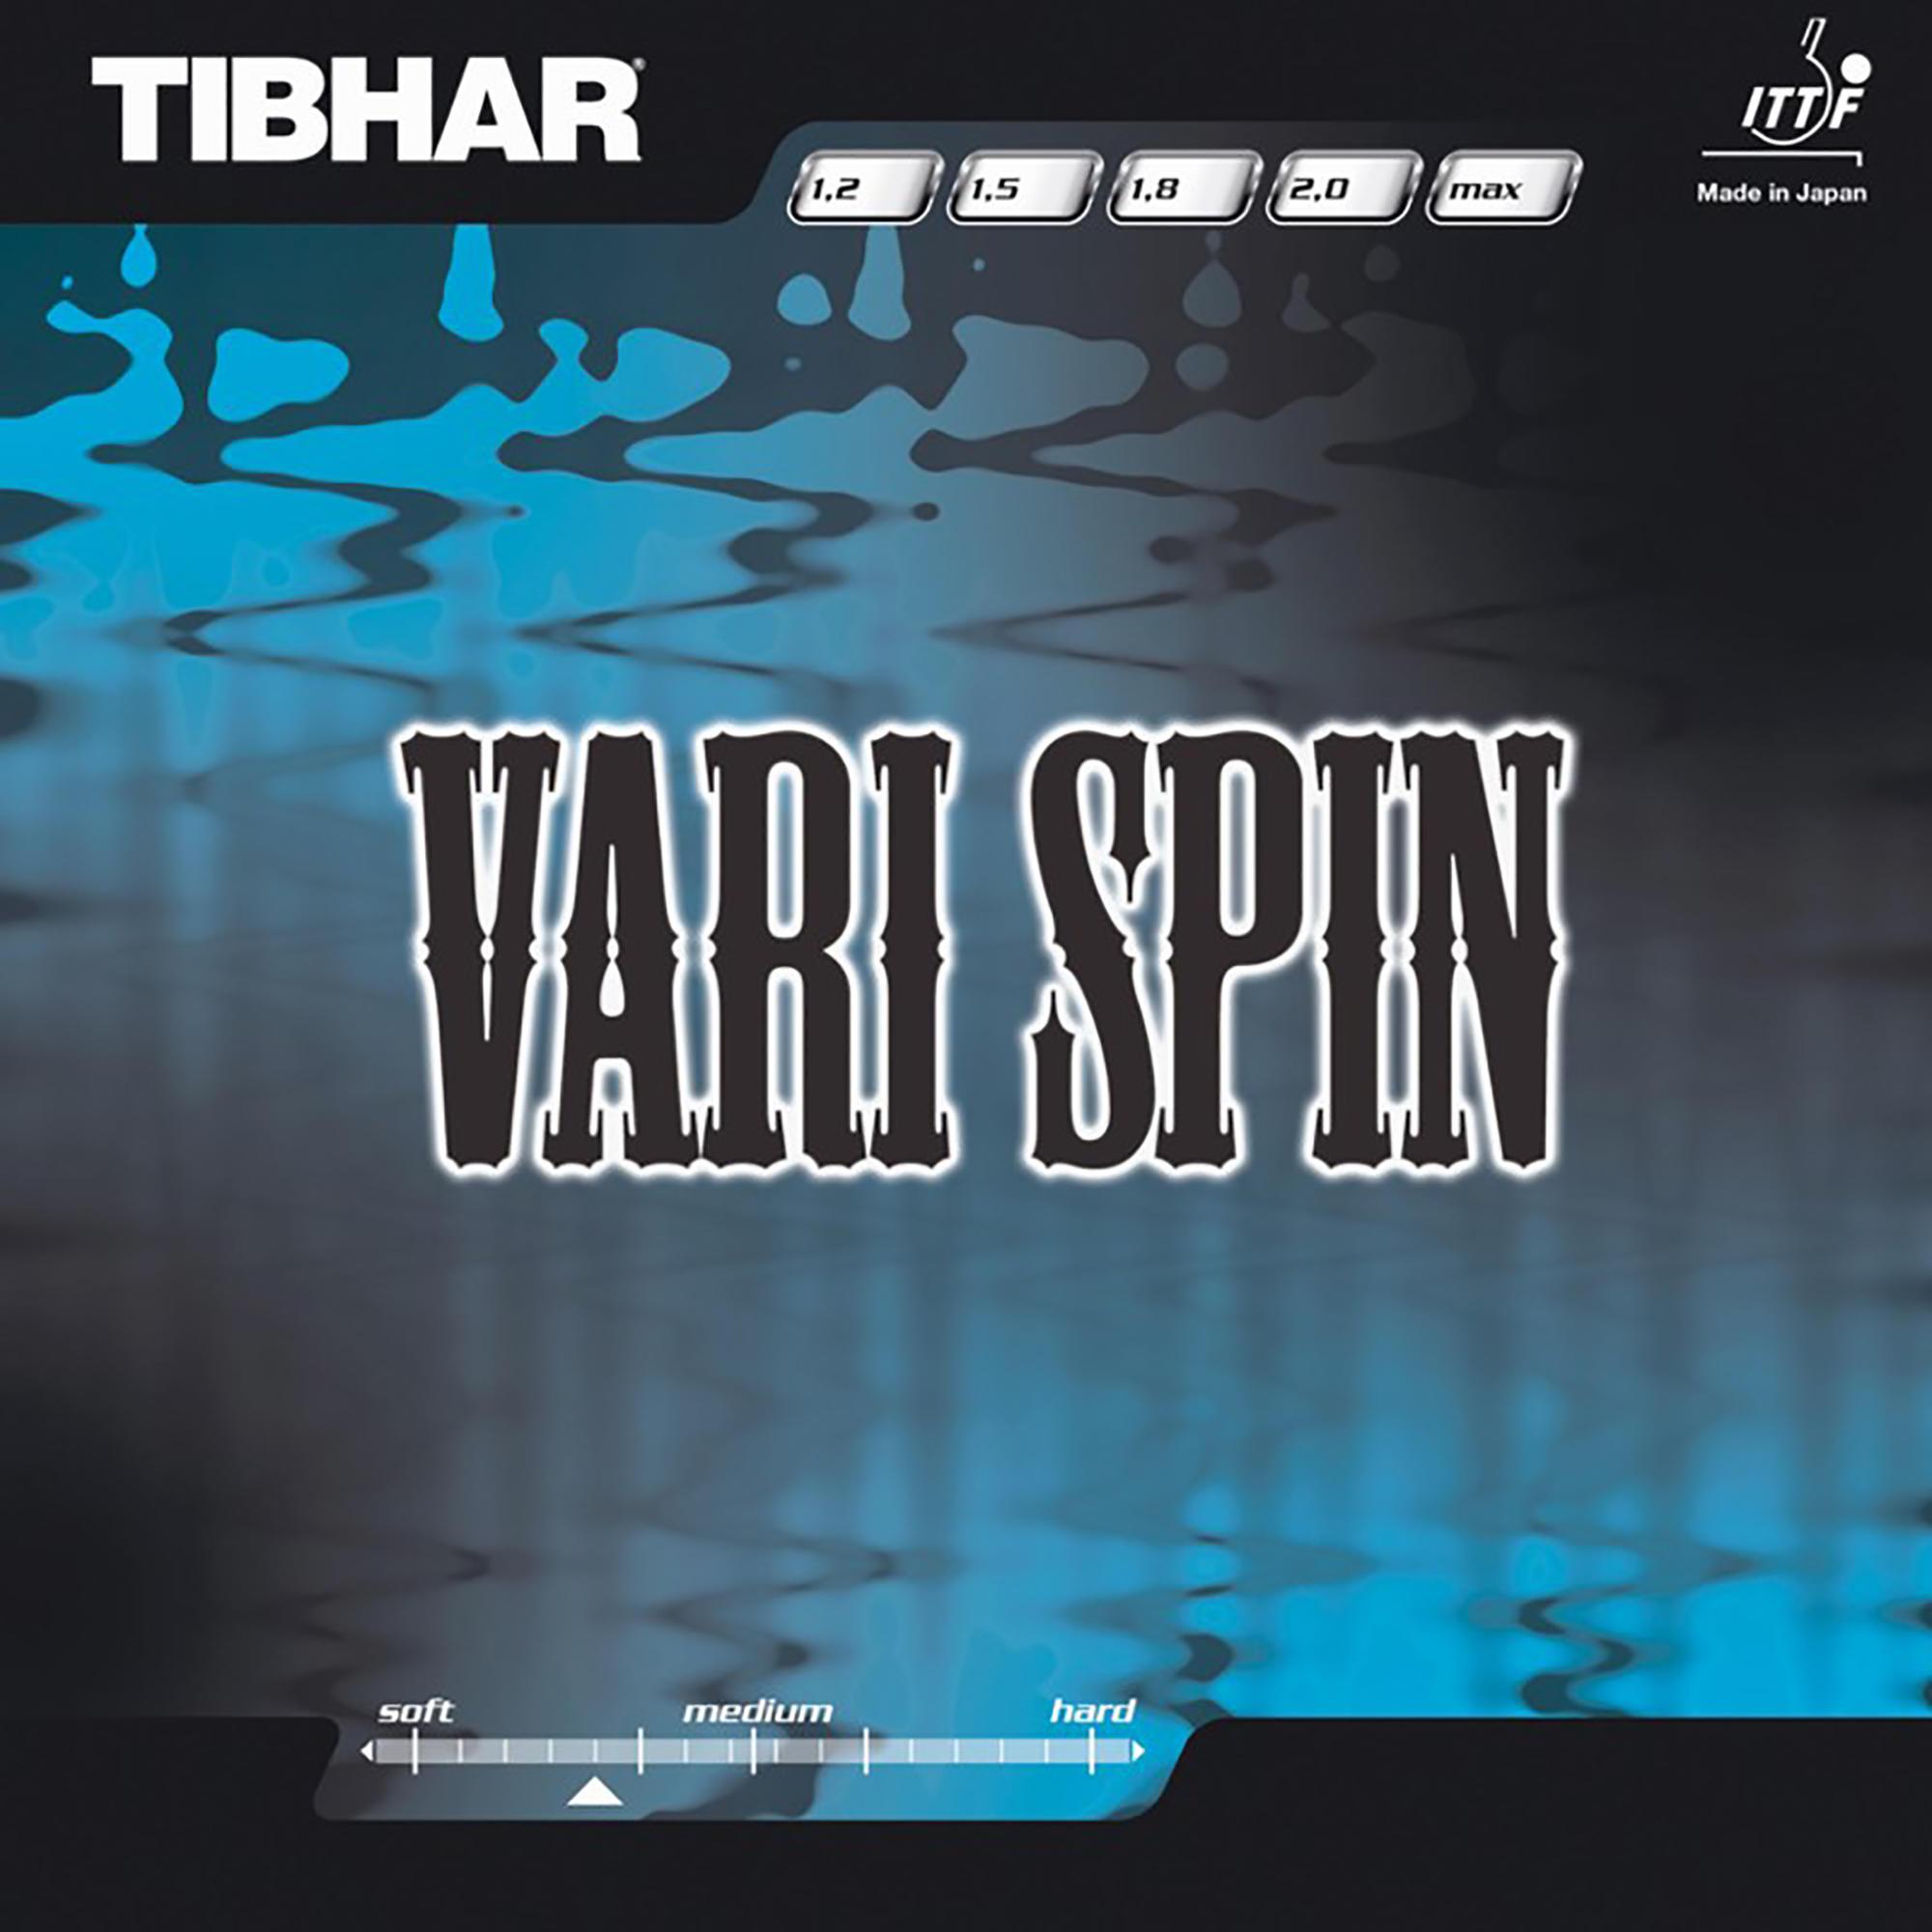 Tibhar Tafeltennis rubbers Vari Spin